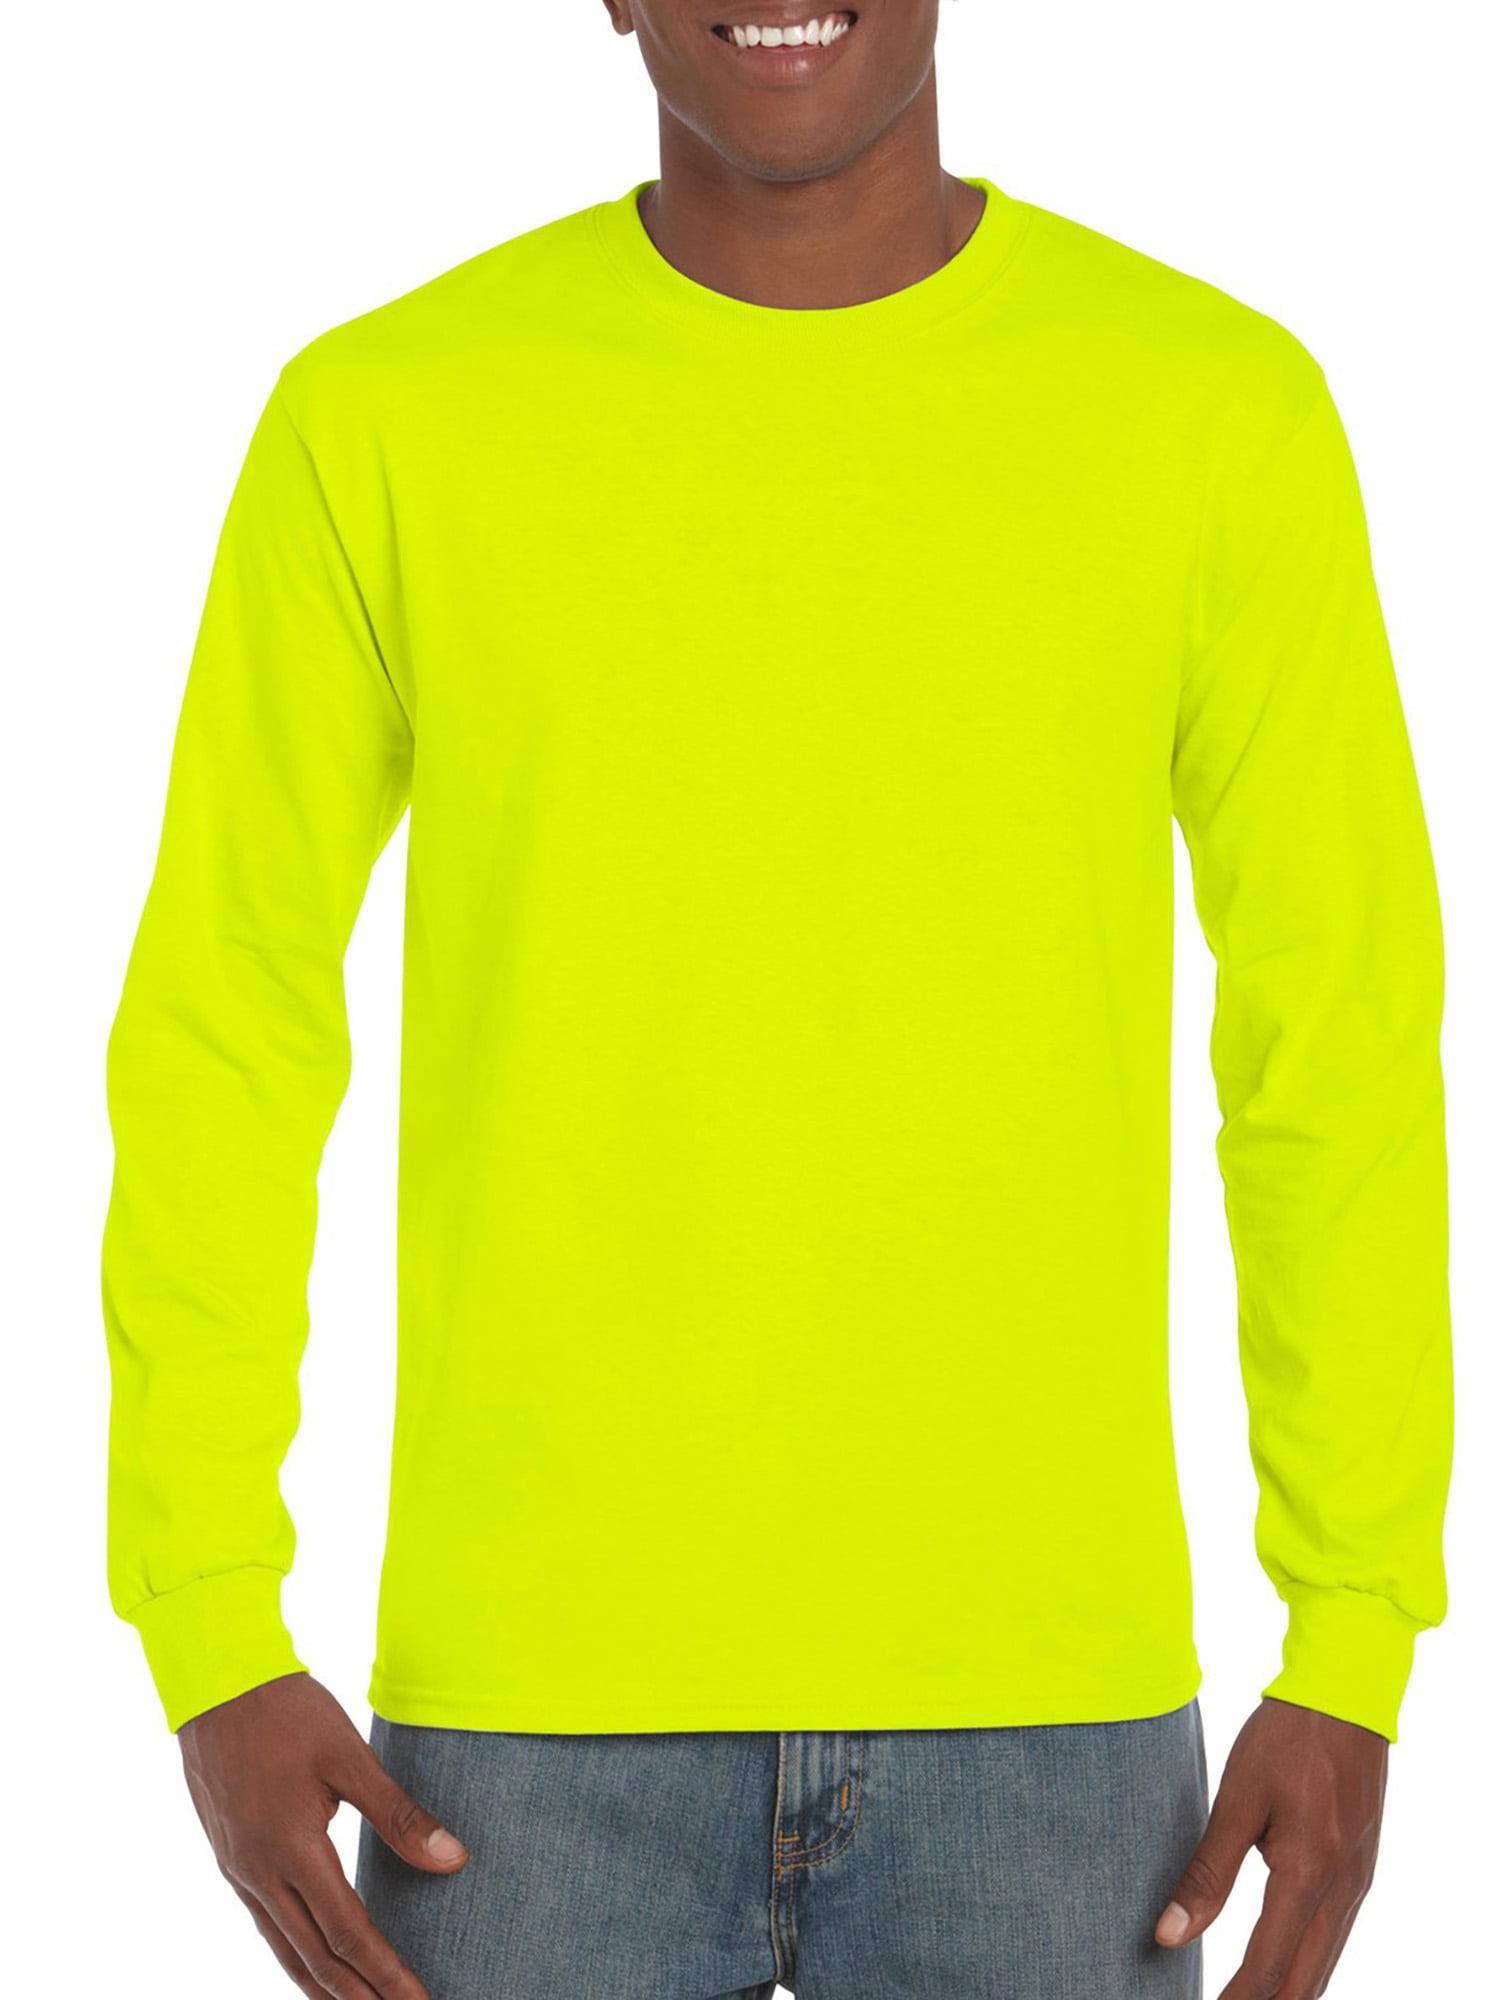 Gildan - Gildan Mens Classic Long Sleeve T-Shirt - Walmart.com b53fa345c7a